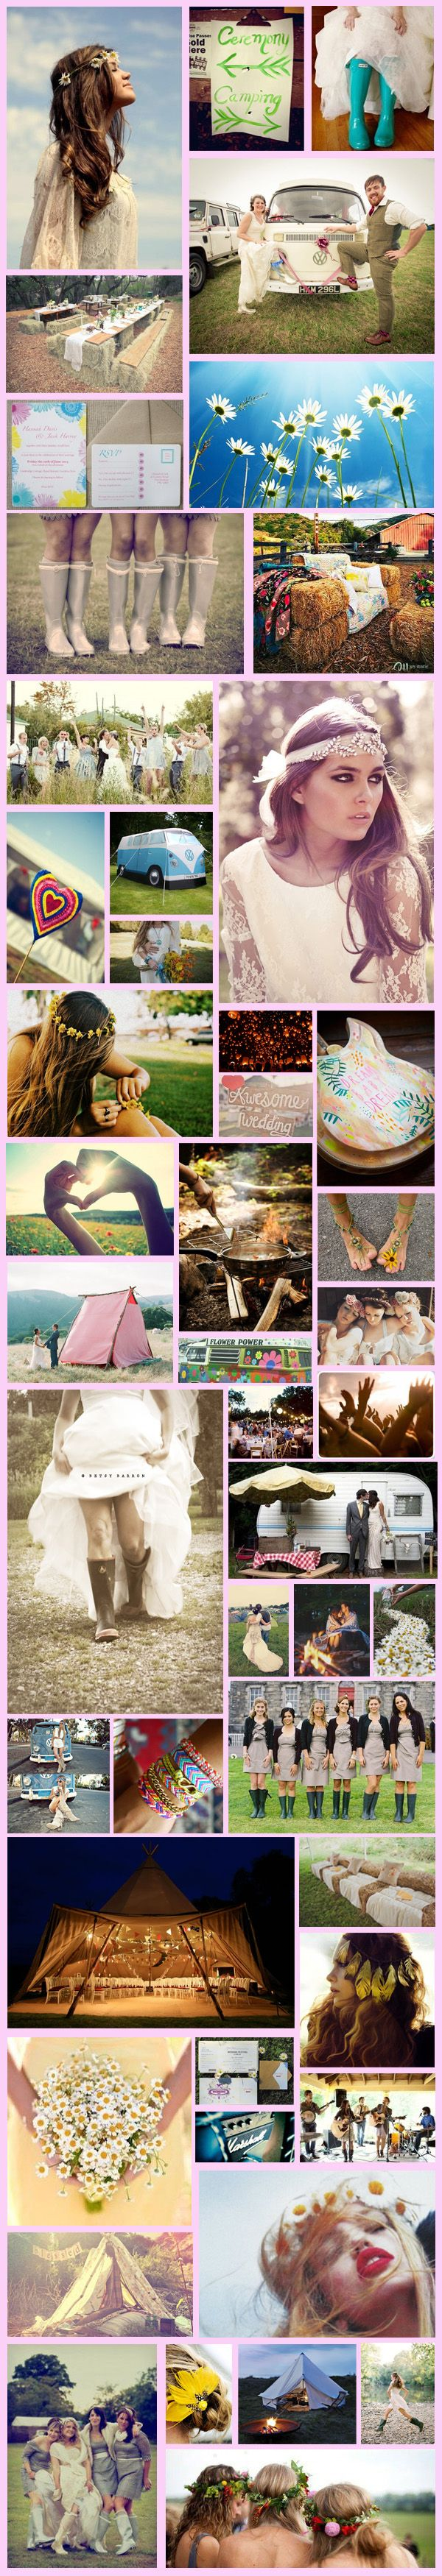 Wednesday Wedding Inspiration: Festival Themed Wedding! on Bespoke-Bride.com